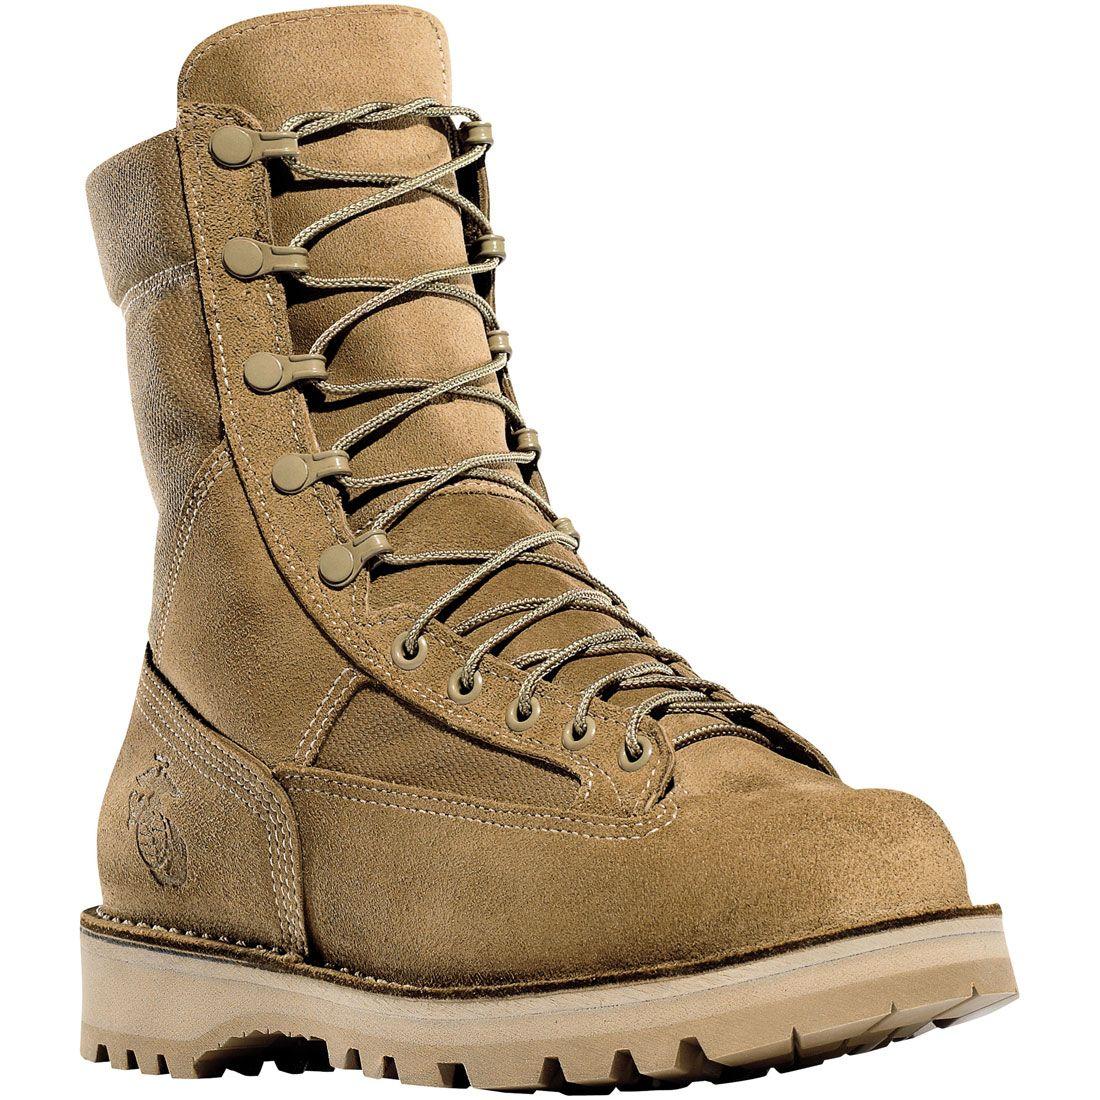 26025 Danner Men S Temperate Usmc Desert Boots Olive